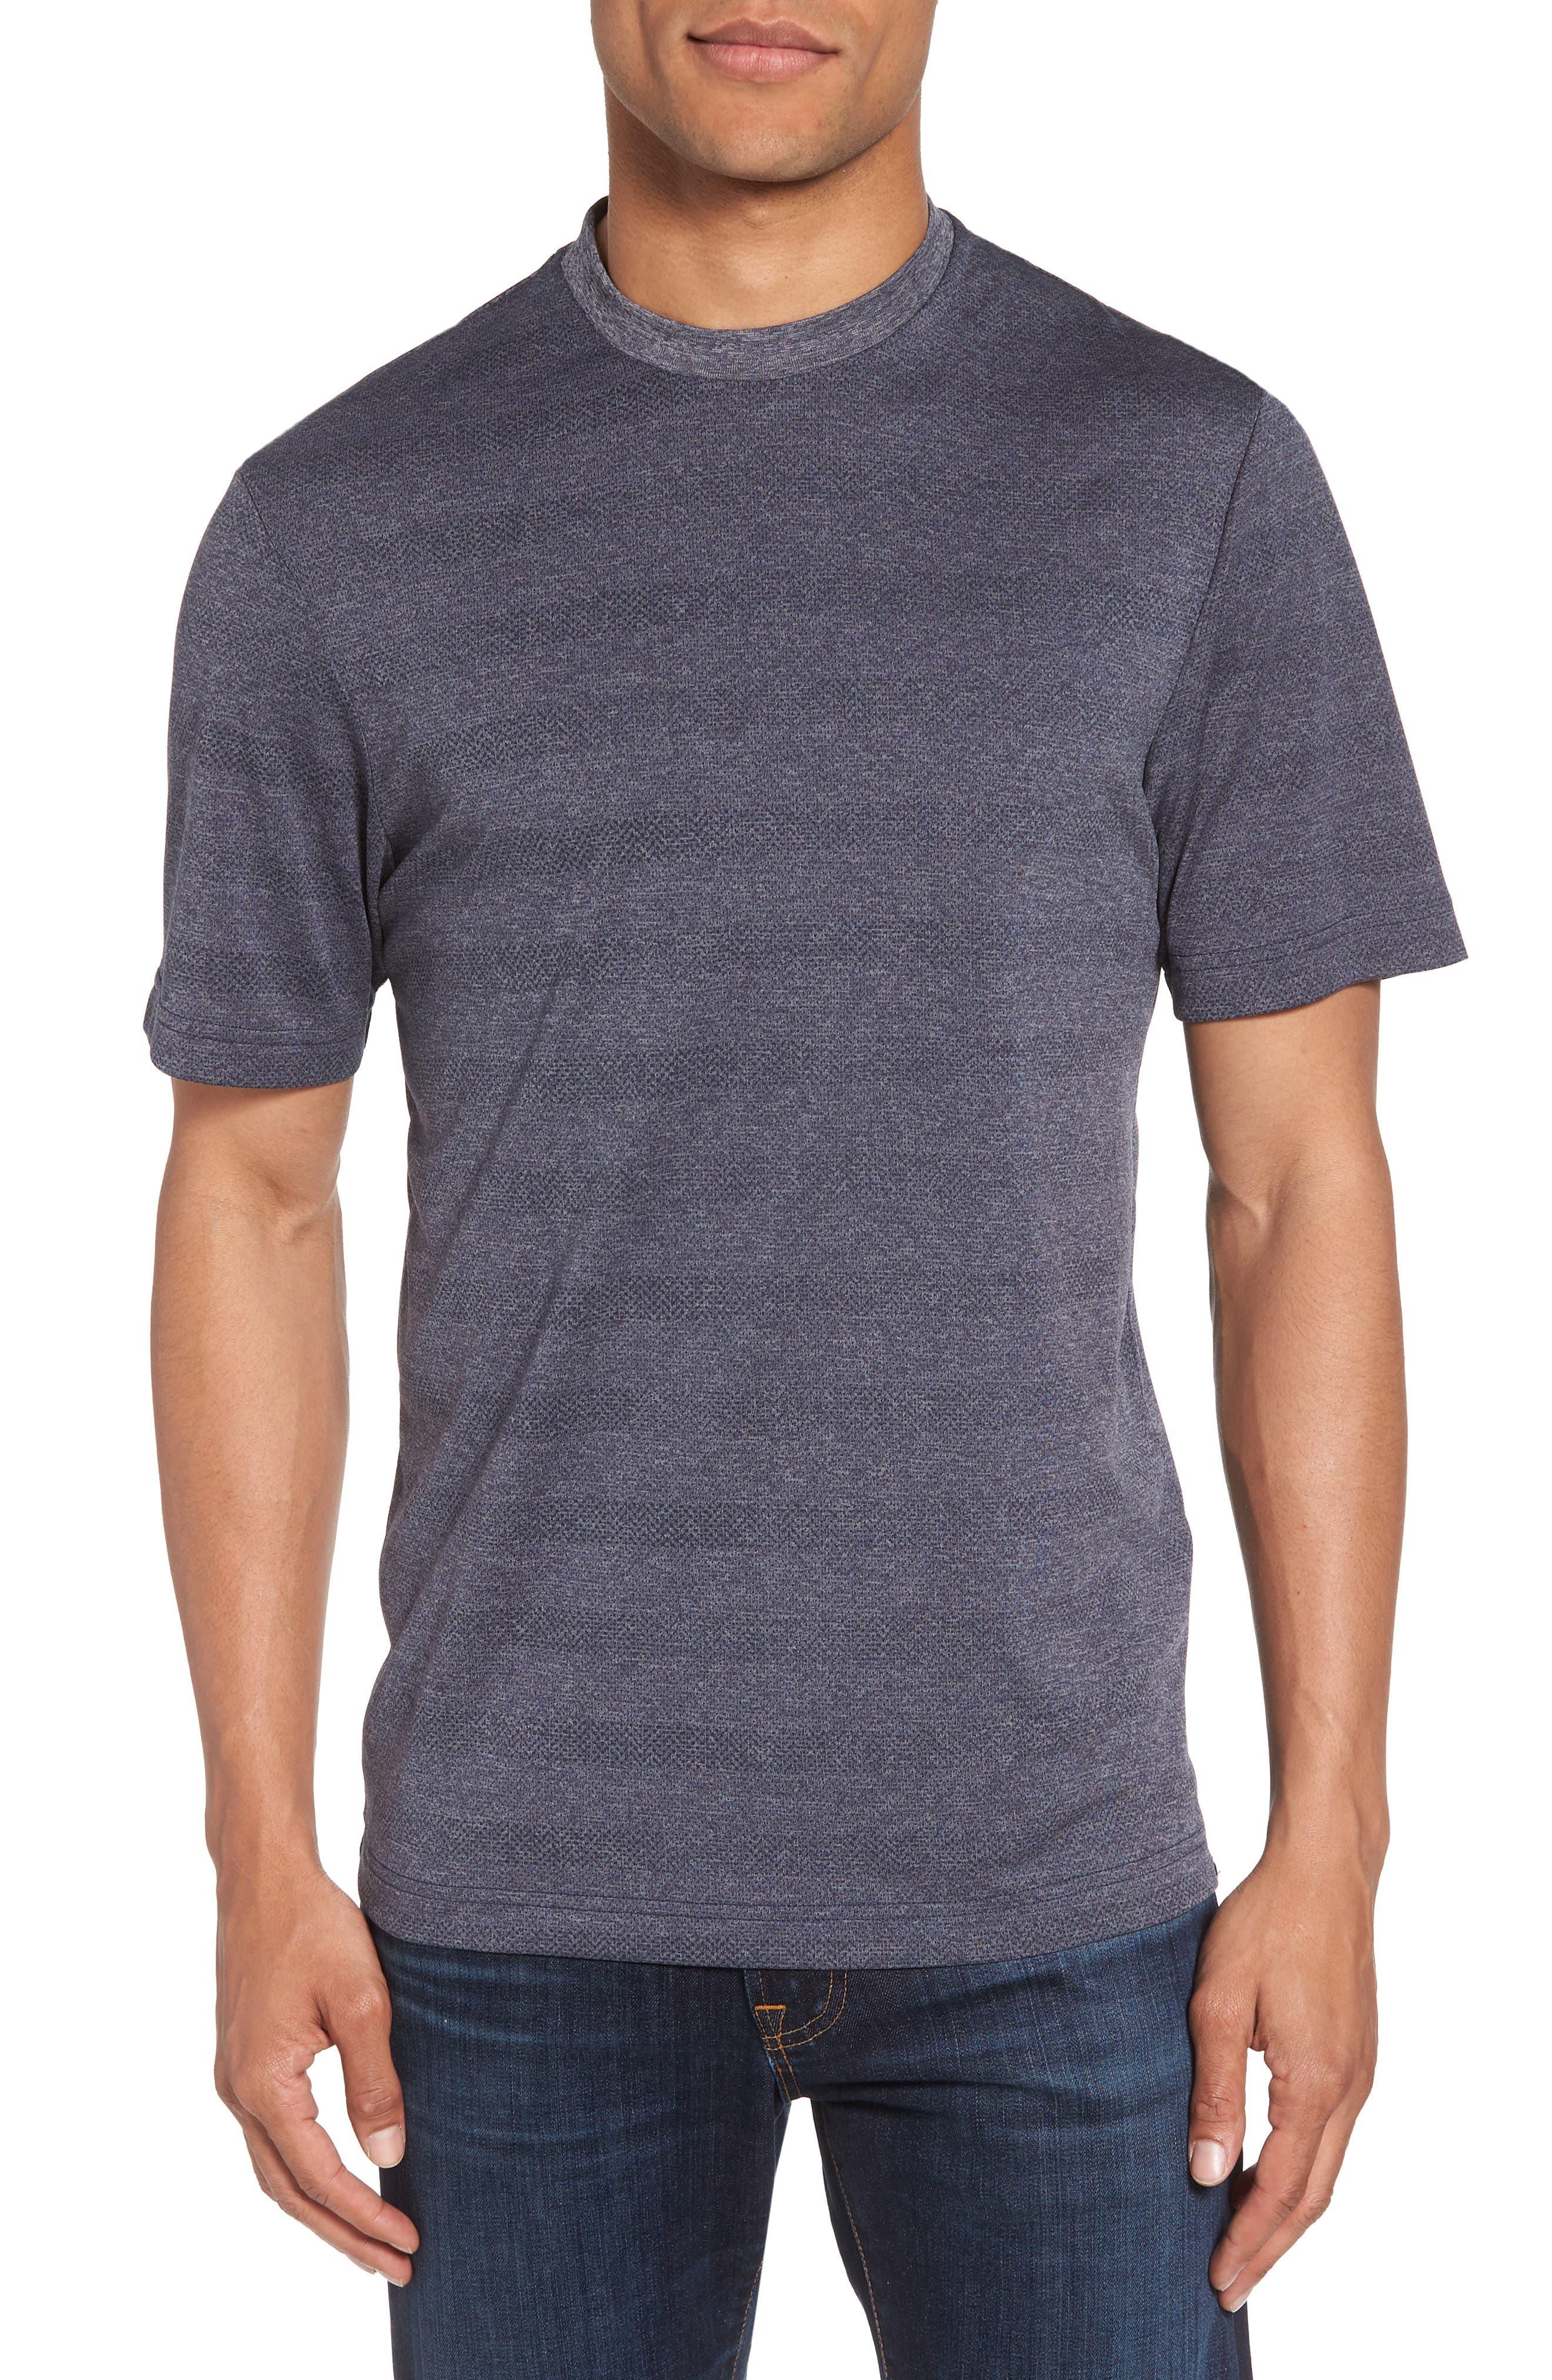 Travis Mathew Upshift T-Shirt